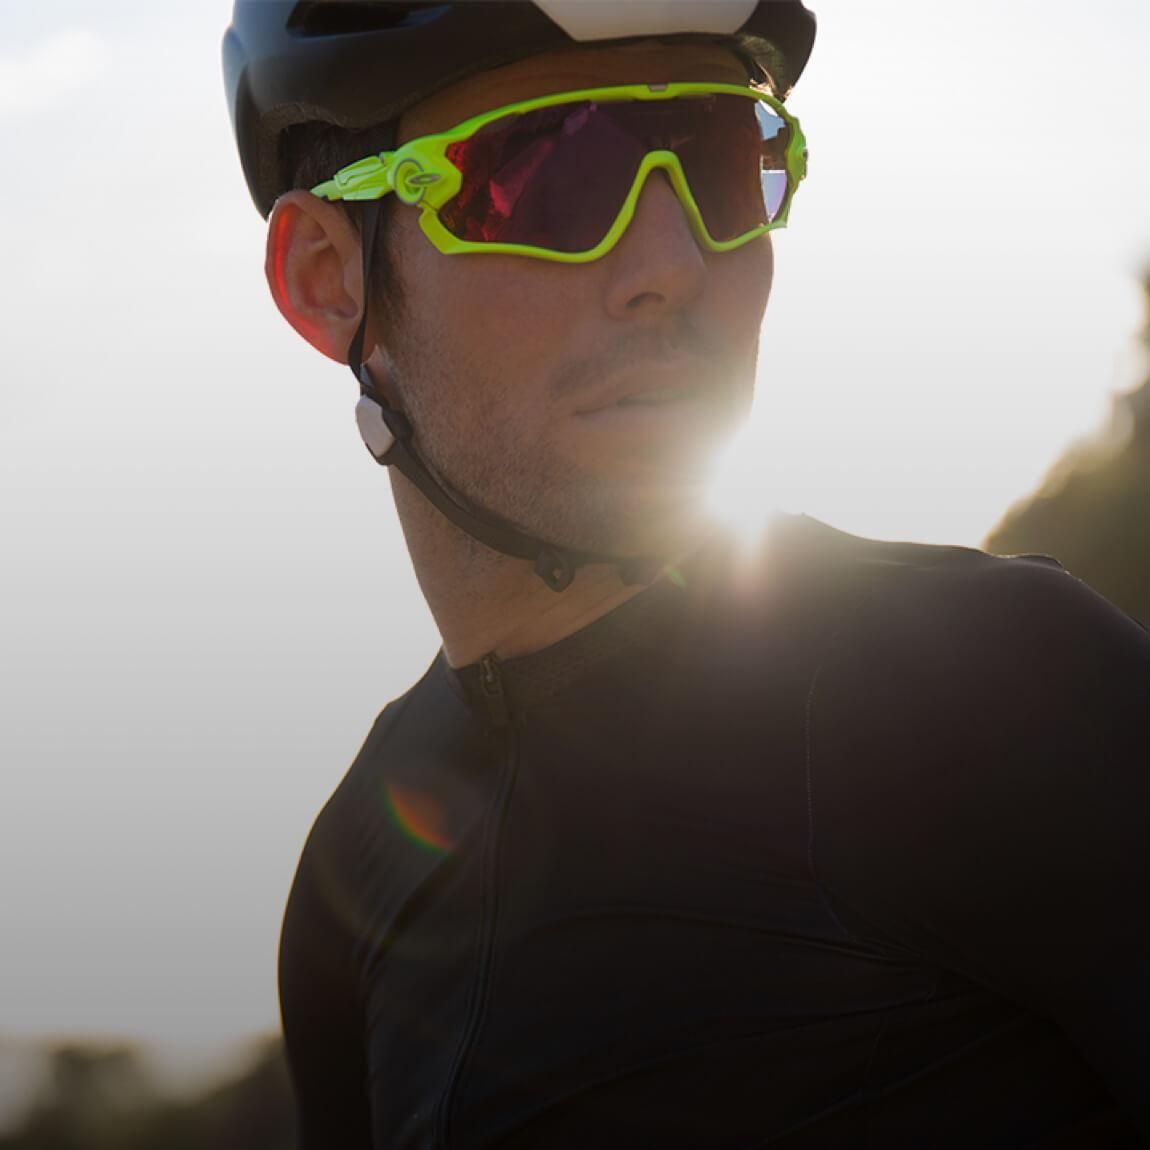 3b9cc53b9a Mark Cavendish wears Oakley JAWBREAKER OO 9290Otticanet.com  Otticanet   sunglasses  eyewear  sport  celebrities  cyclism